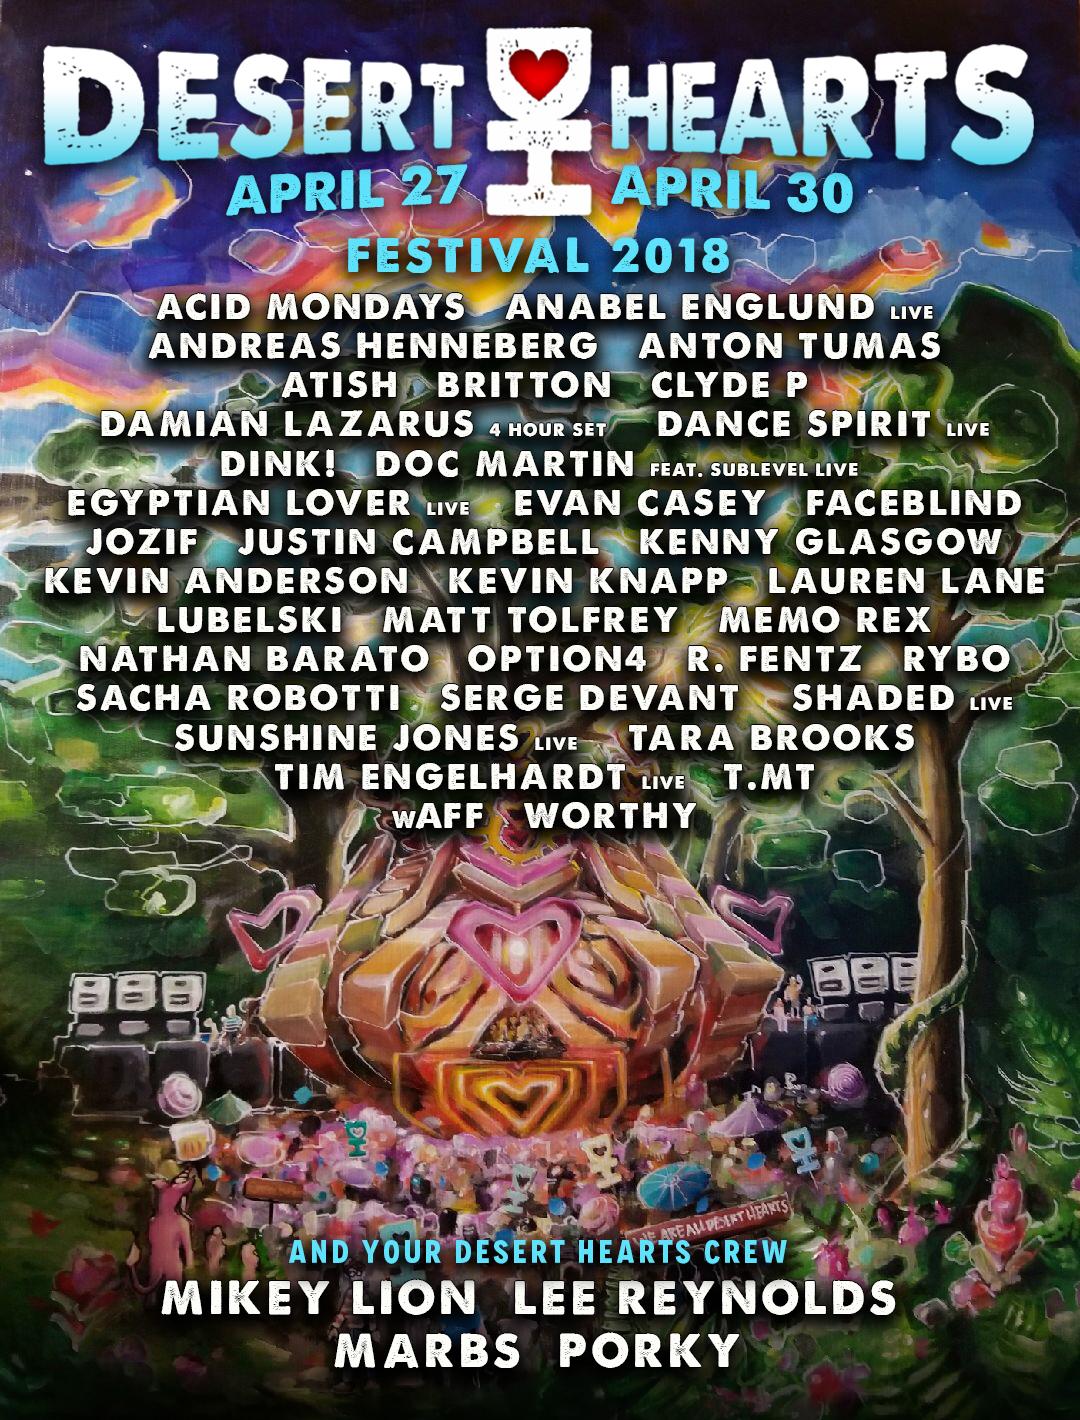 Desert Hearts Festival Lineup